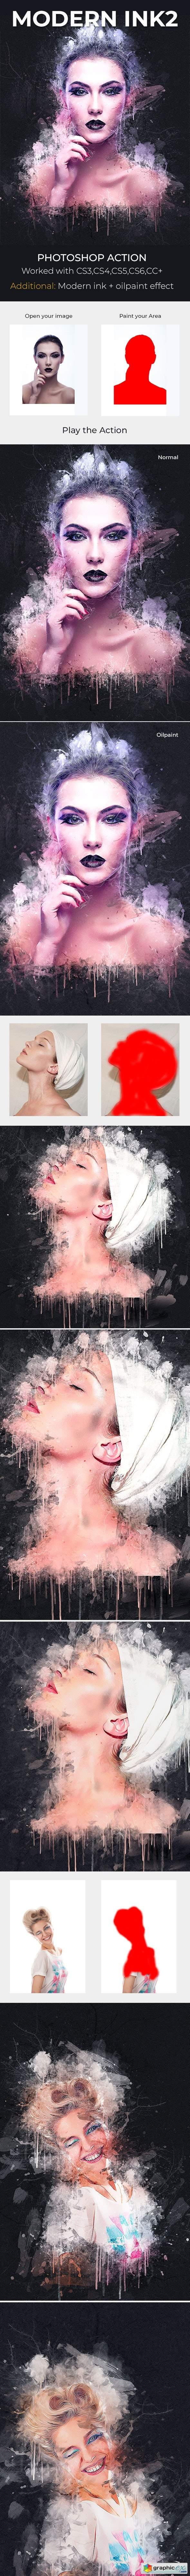 Modern Ink2 Photoshop Action